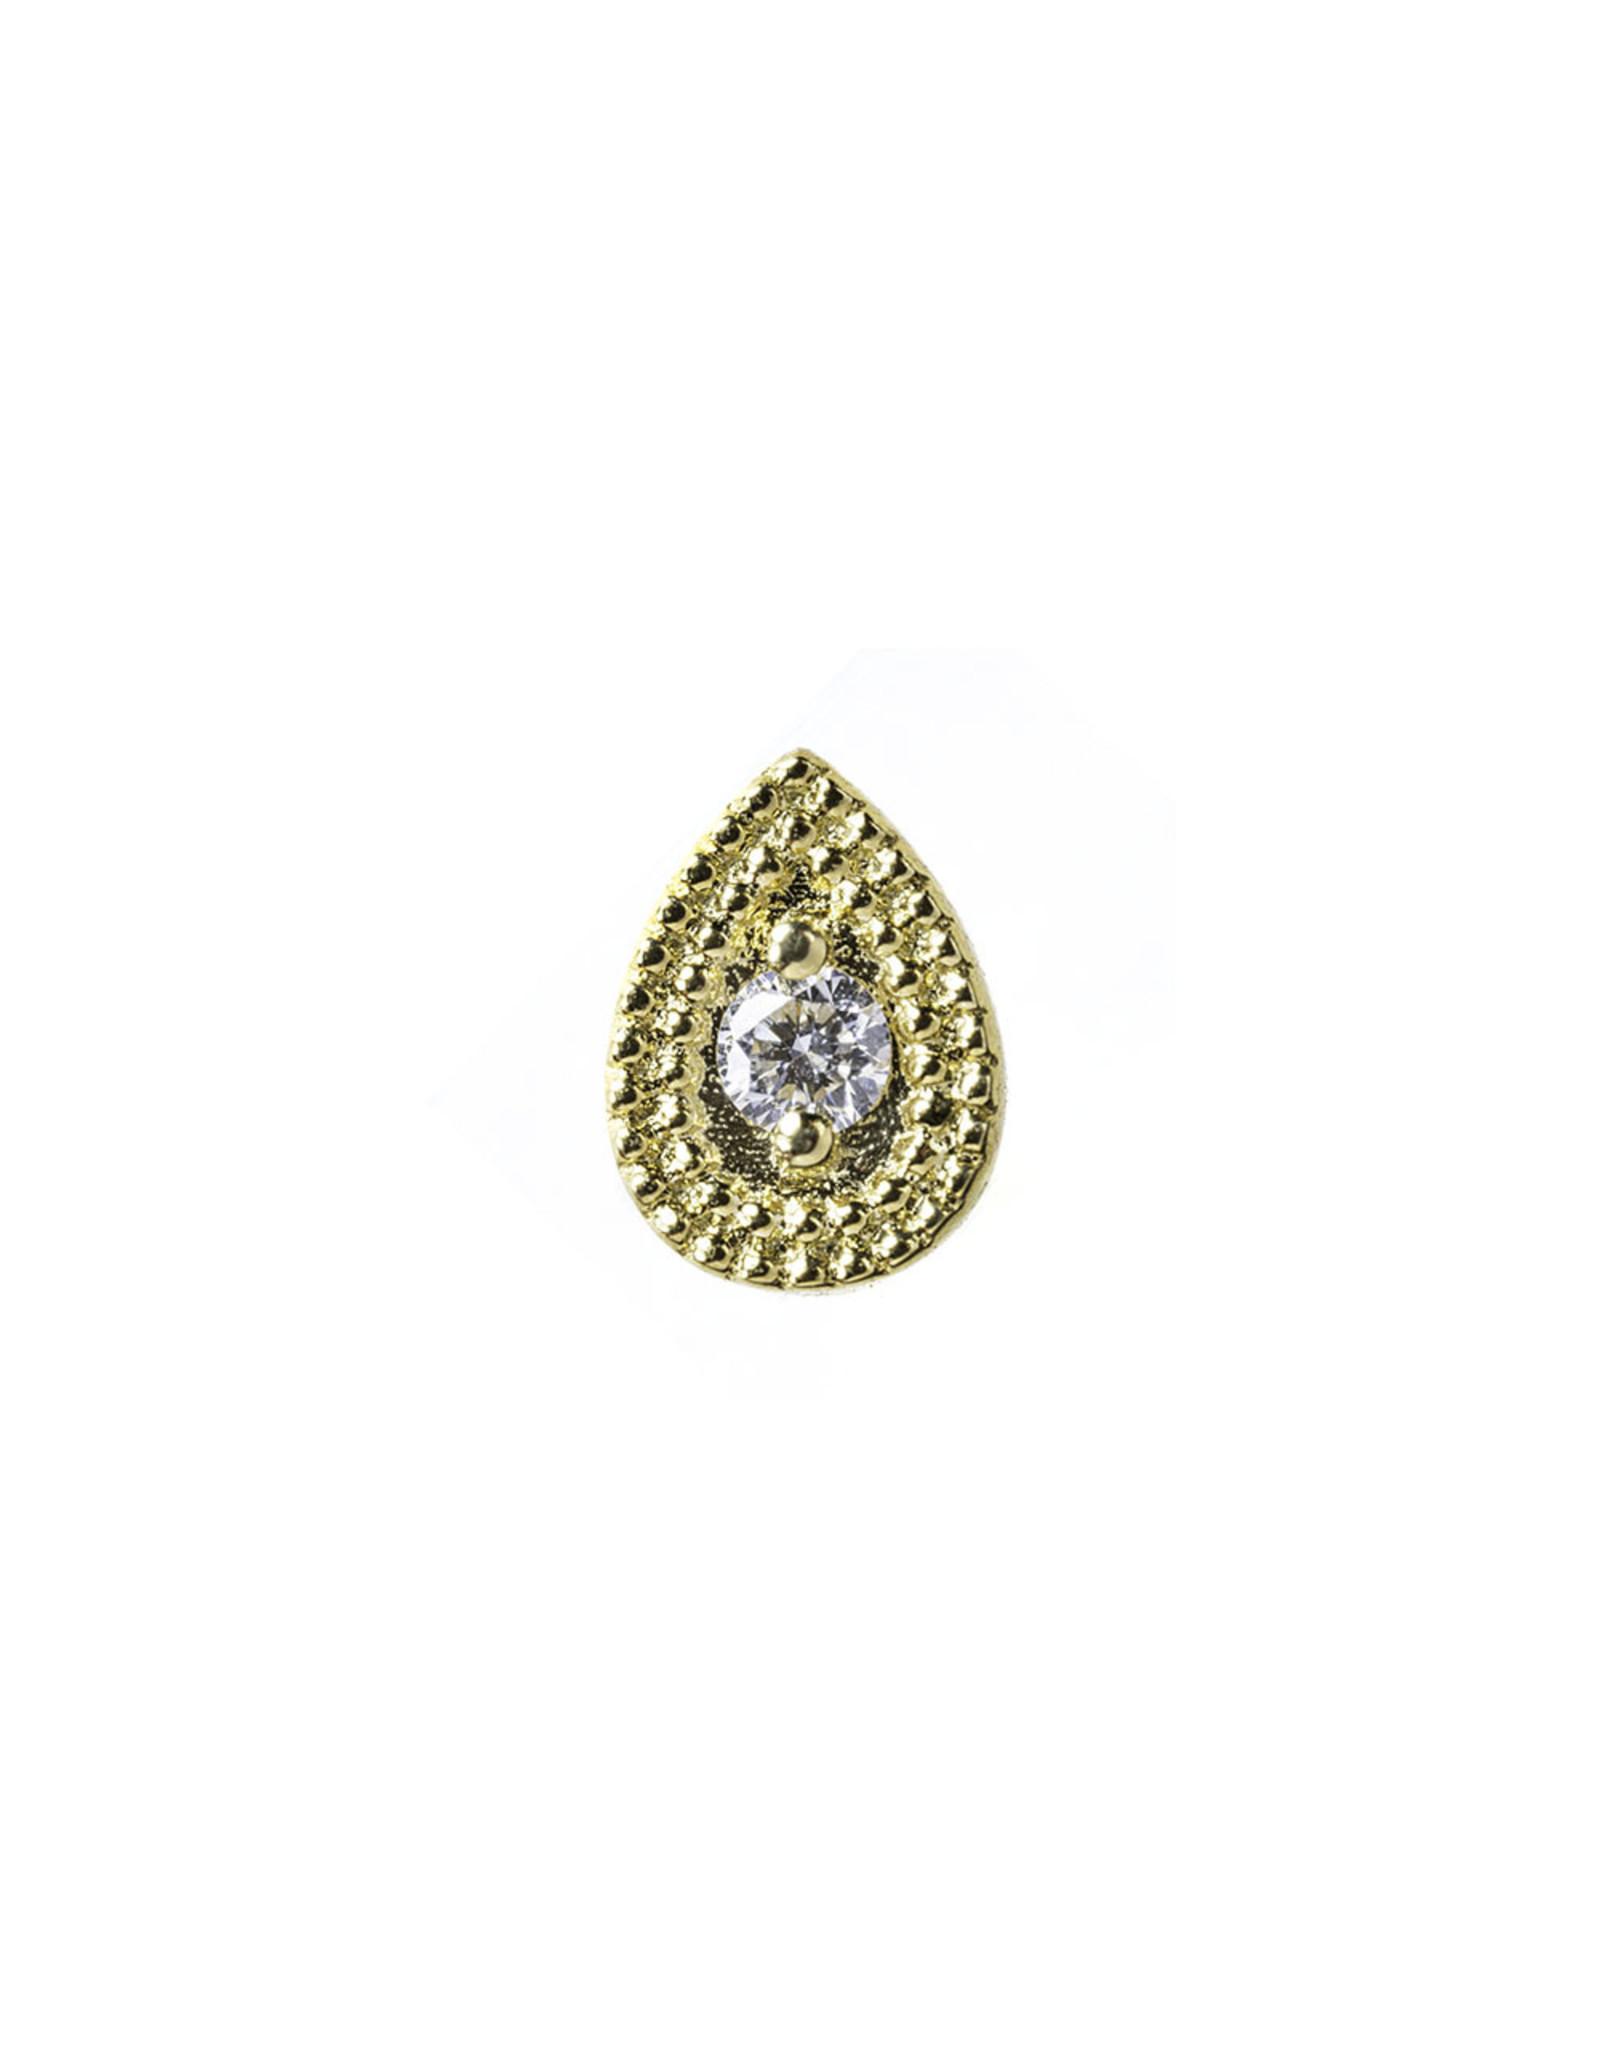 "BVLA BVLA 6x4 yellow gold ""Double Milgrain Pear Harlequin"" press fit end with 2.0 VS1 diamond"